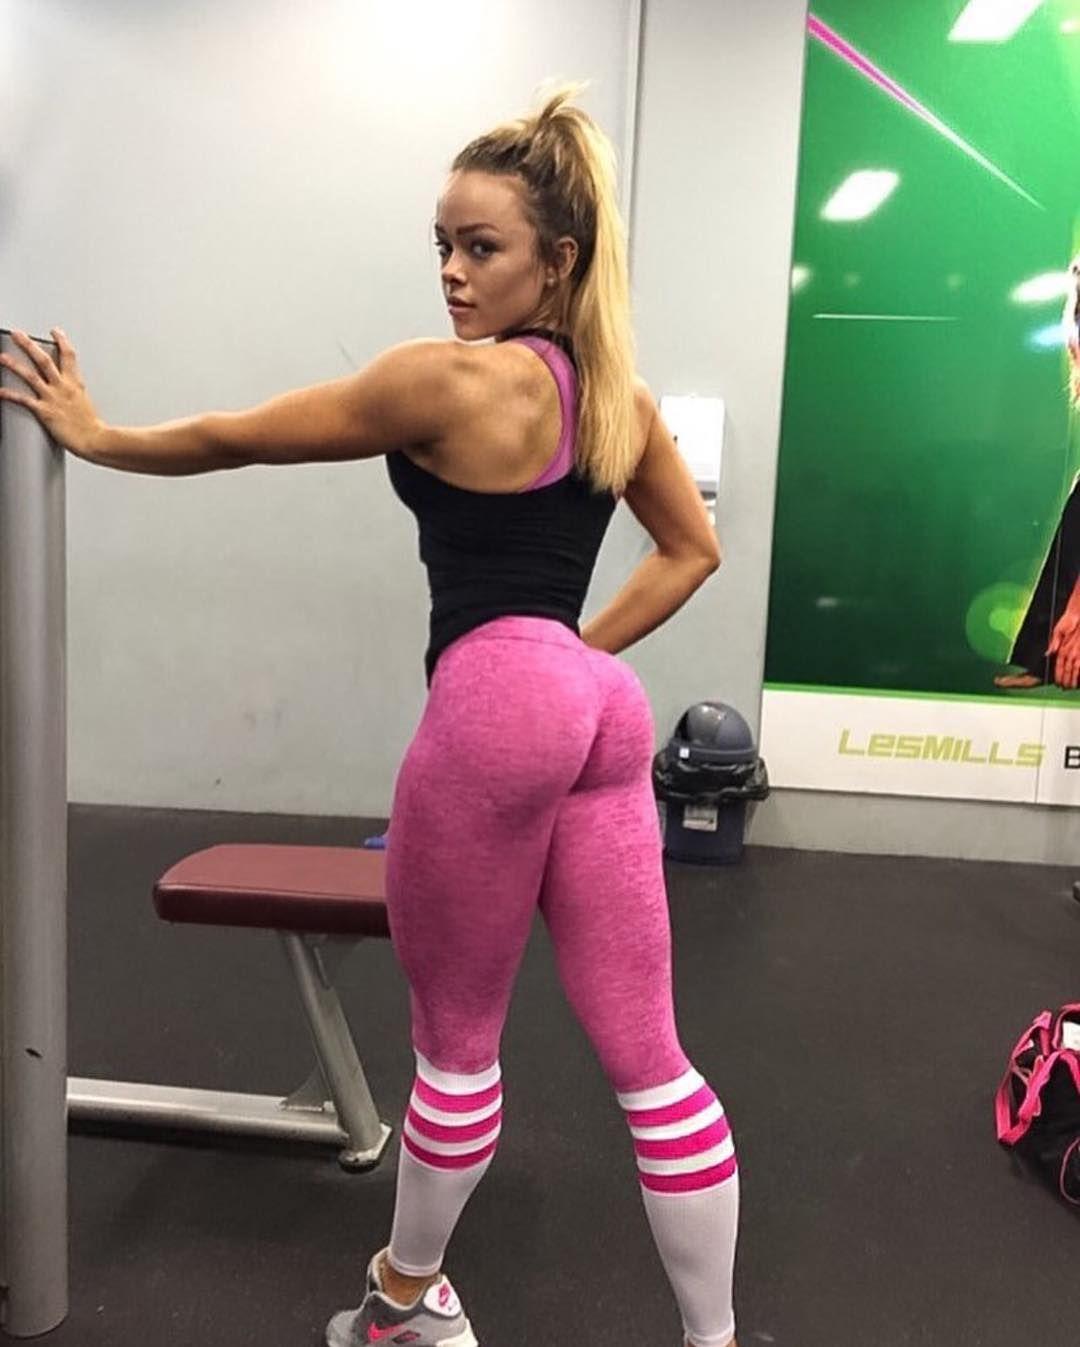 Sexy gym clothing